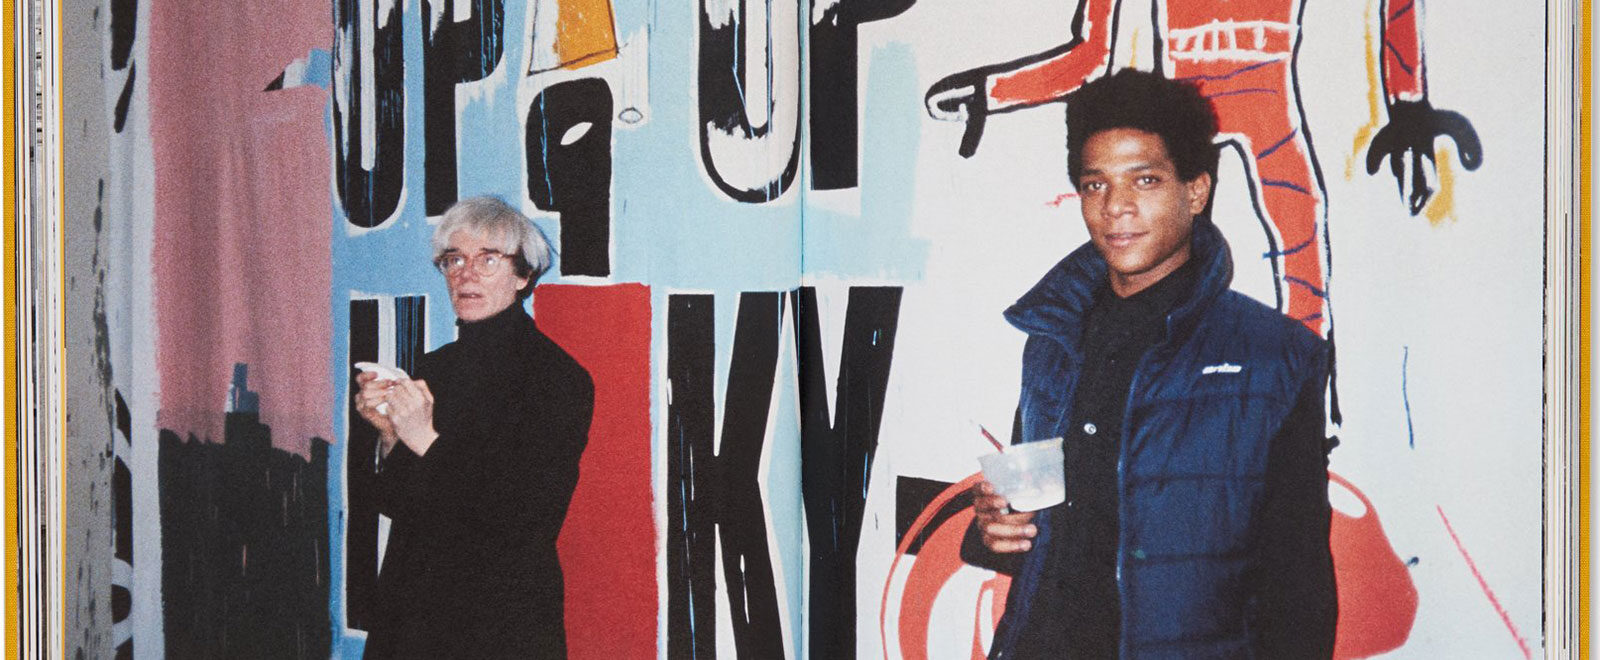 Paige Powell Andy Warhol Basquiet Bill Cunningham John Lennon Bob Gruen Ken Schles New York 80s Allan Tannenbaum Walt Cassidy